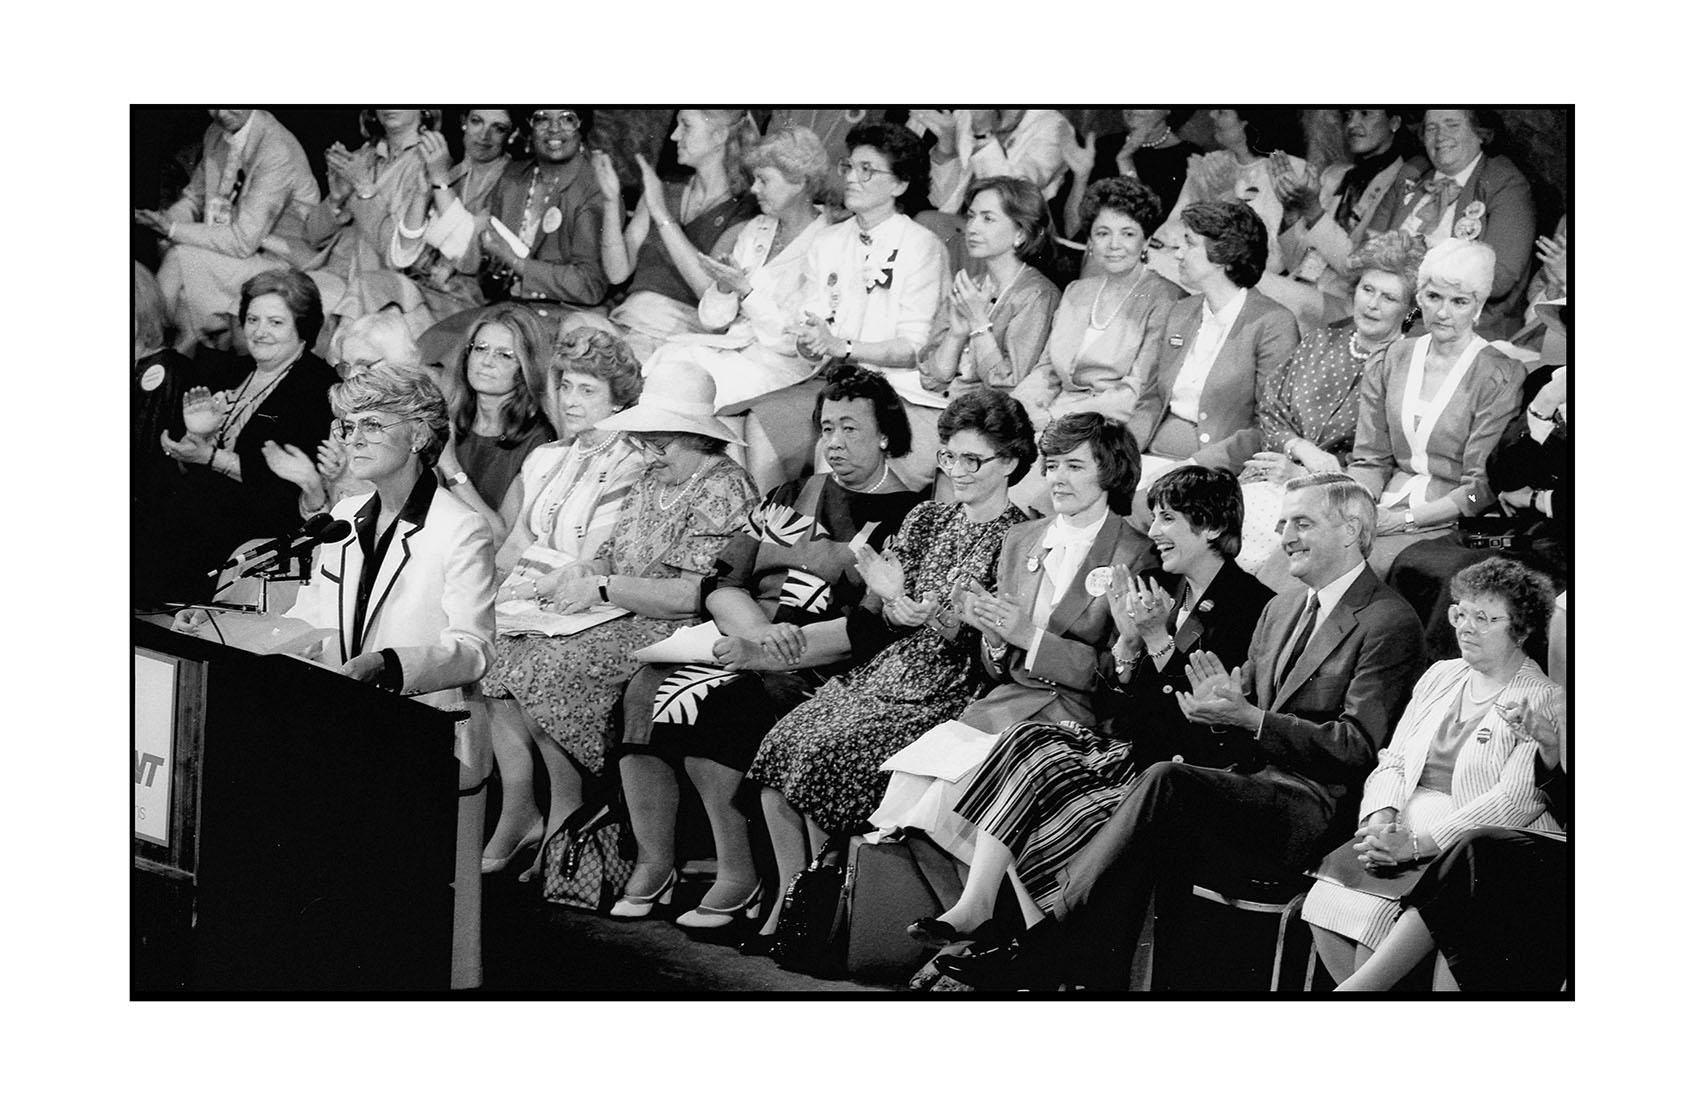 1984 Democratic Convention